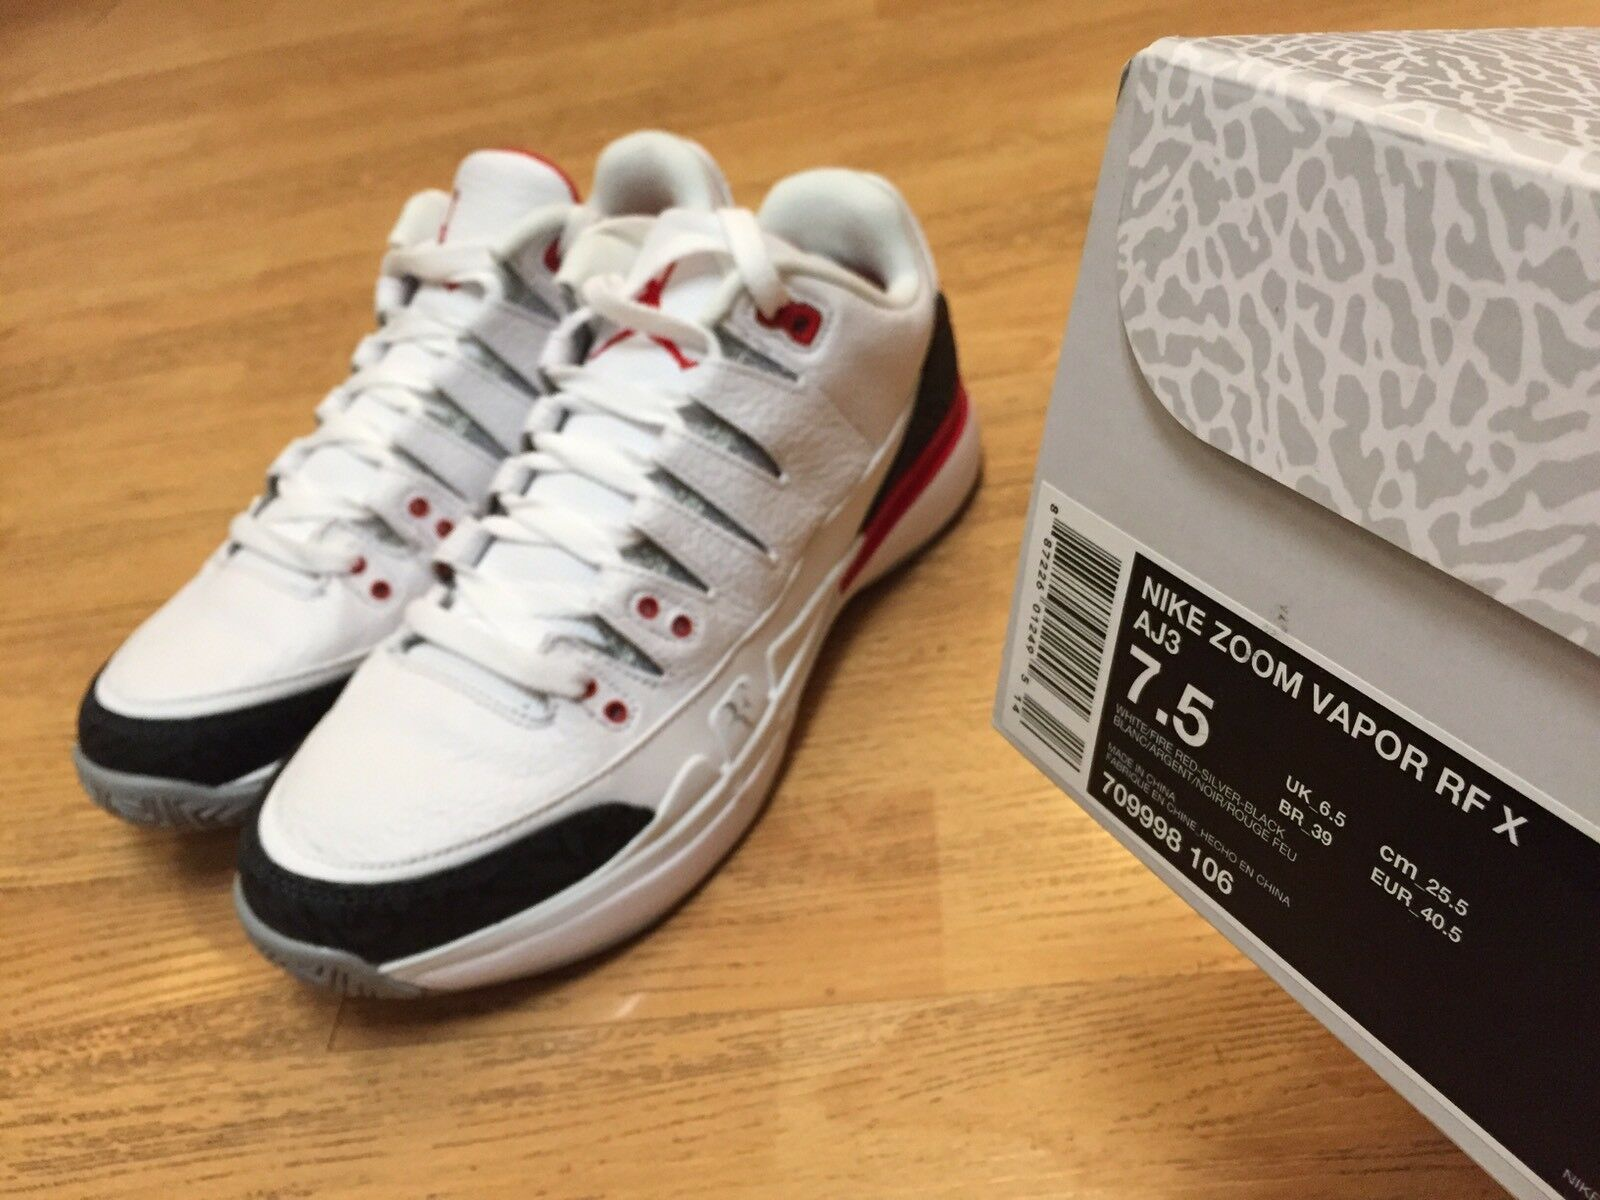 new style 2c513 96d86 ... Nike Zoom Vapor RF X AJ3 Fire Fire Fire Red Retro Jordan Roger Federer  Men 7.5 ...